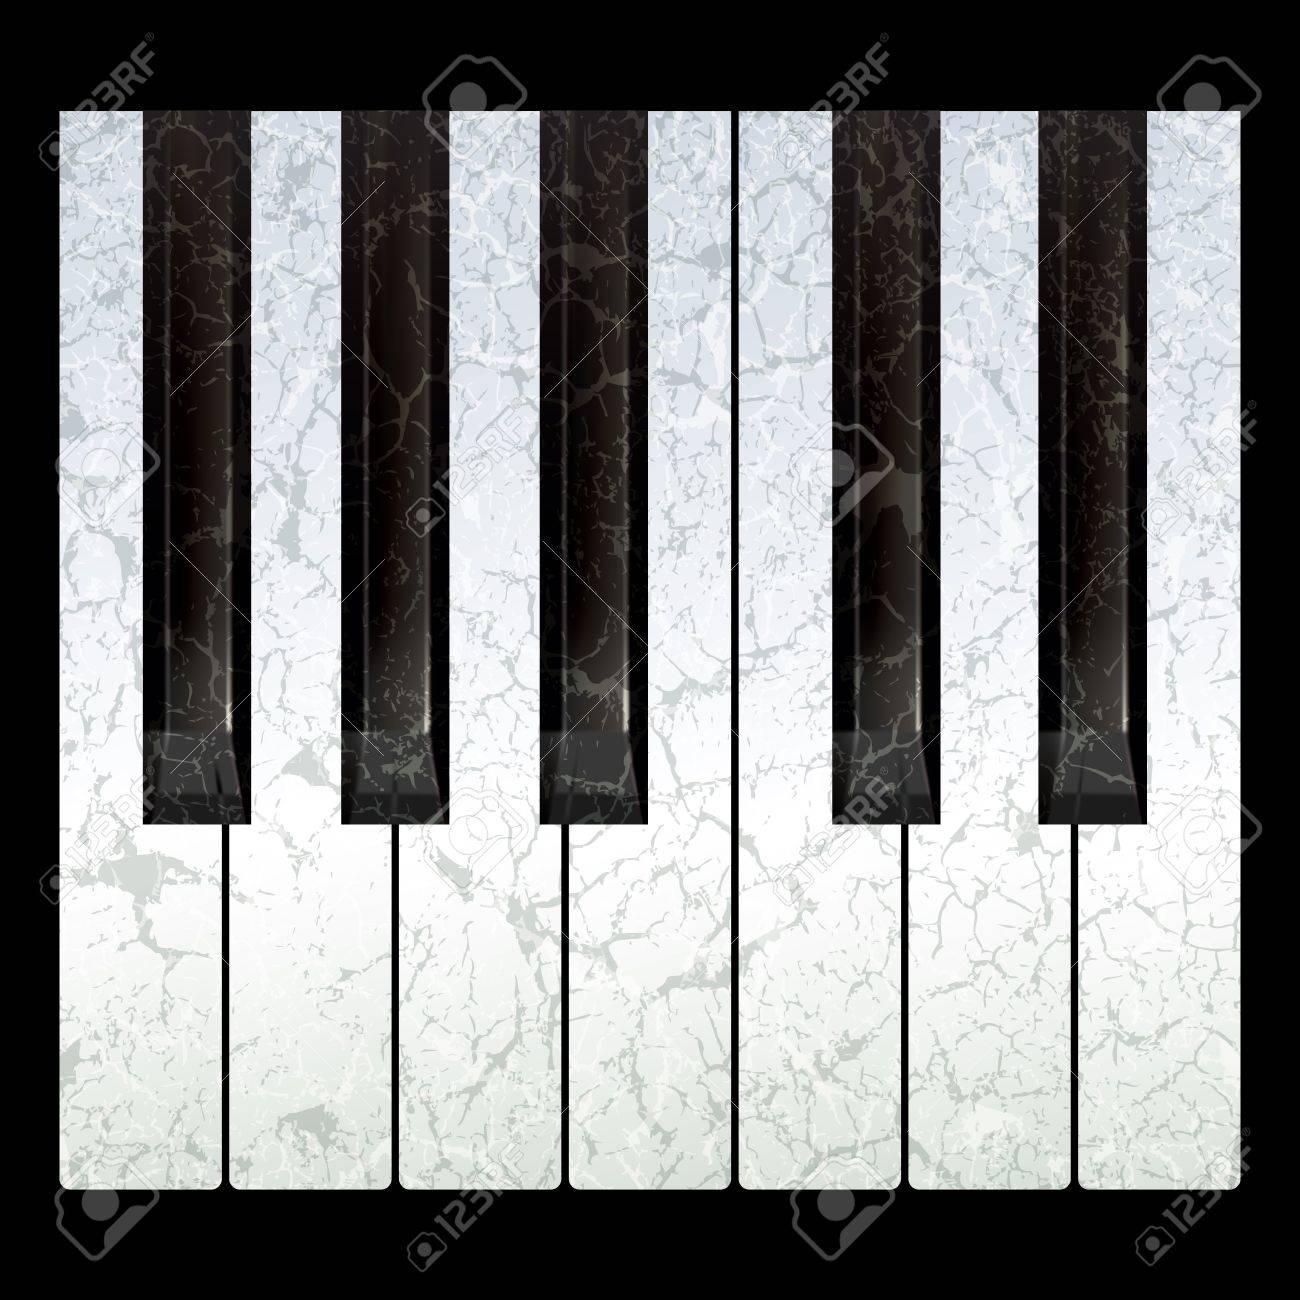 Piano Black Background Piano Keys Isolated on a Black